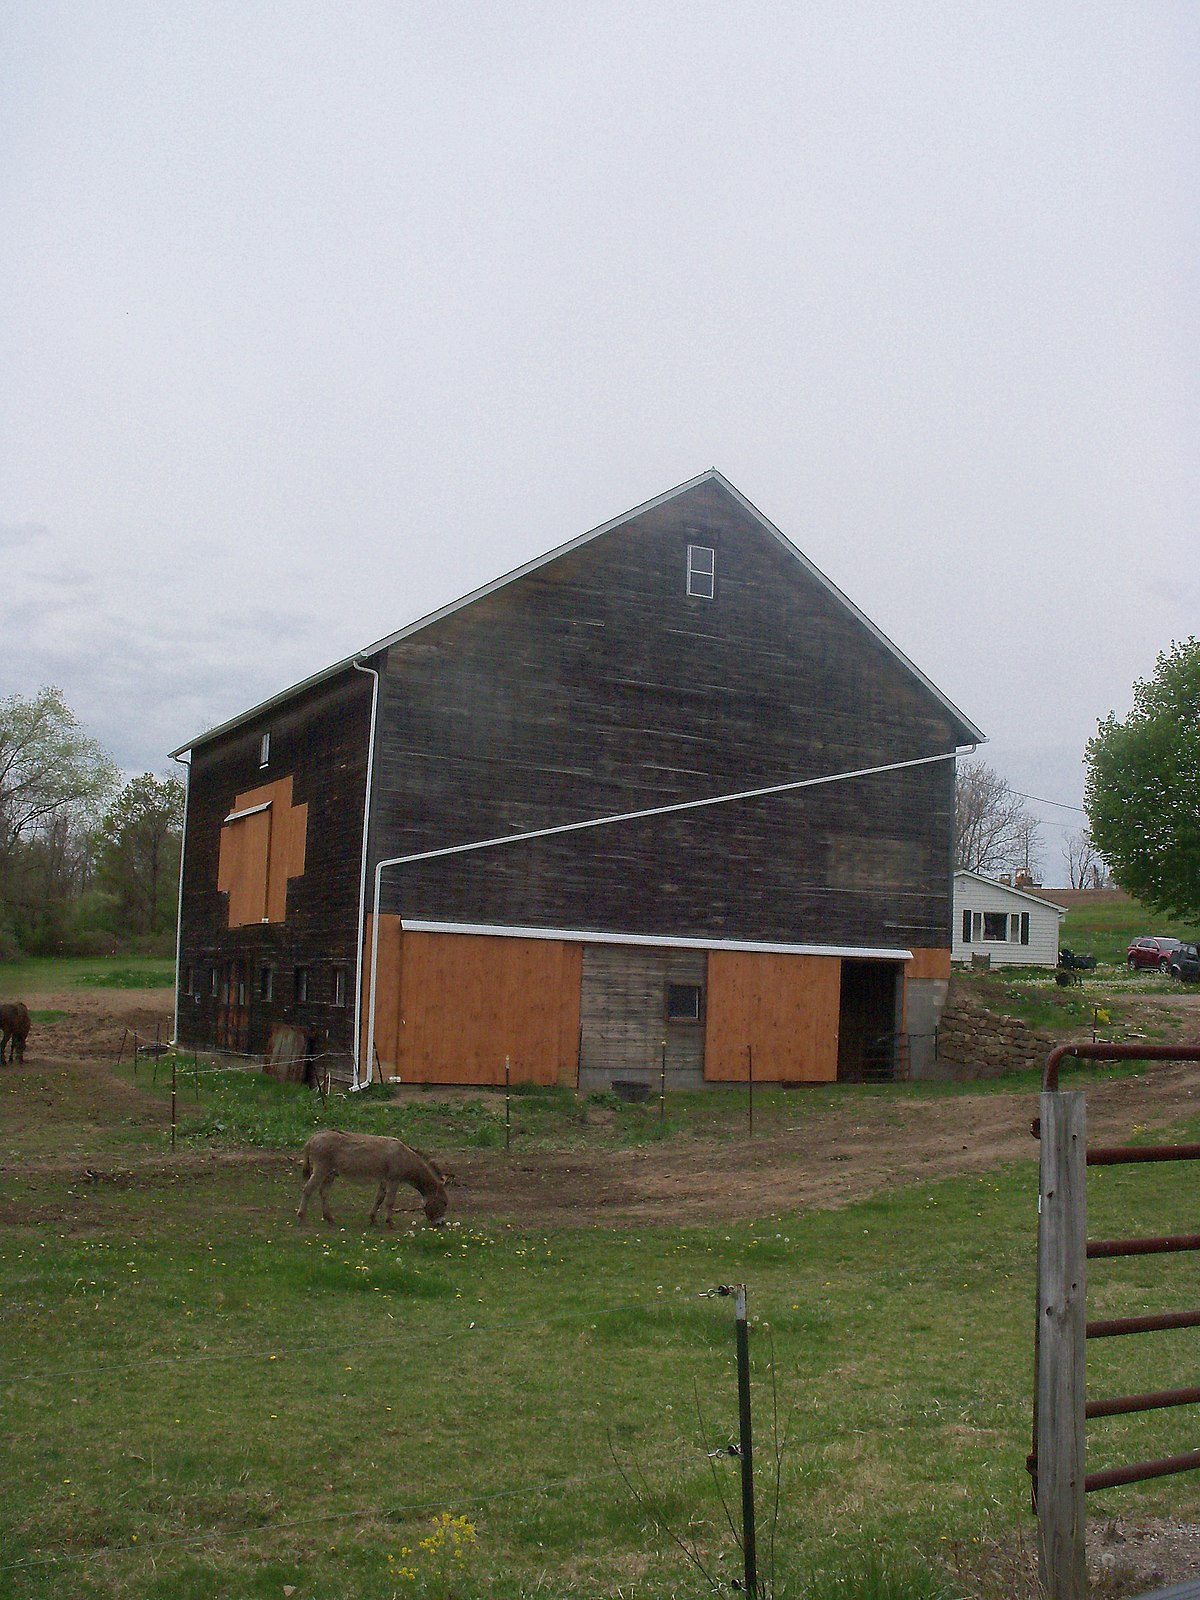 Ohio columbiana county rogers - Ohio Columbiana County Rogers 15